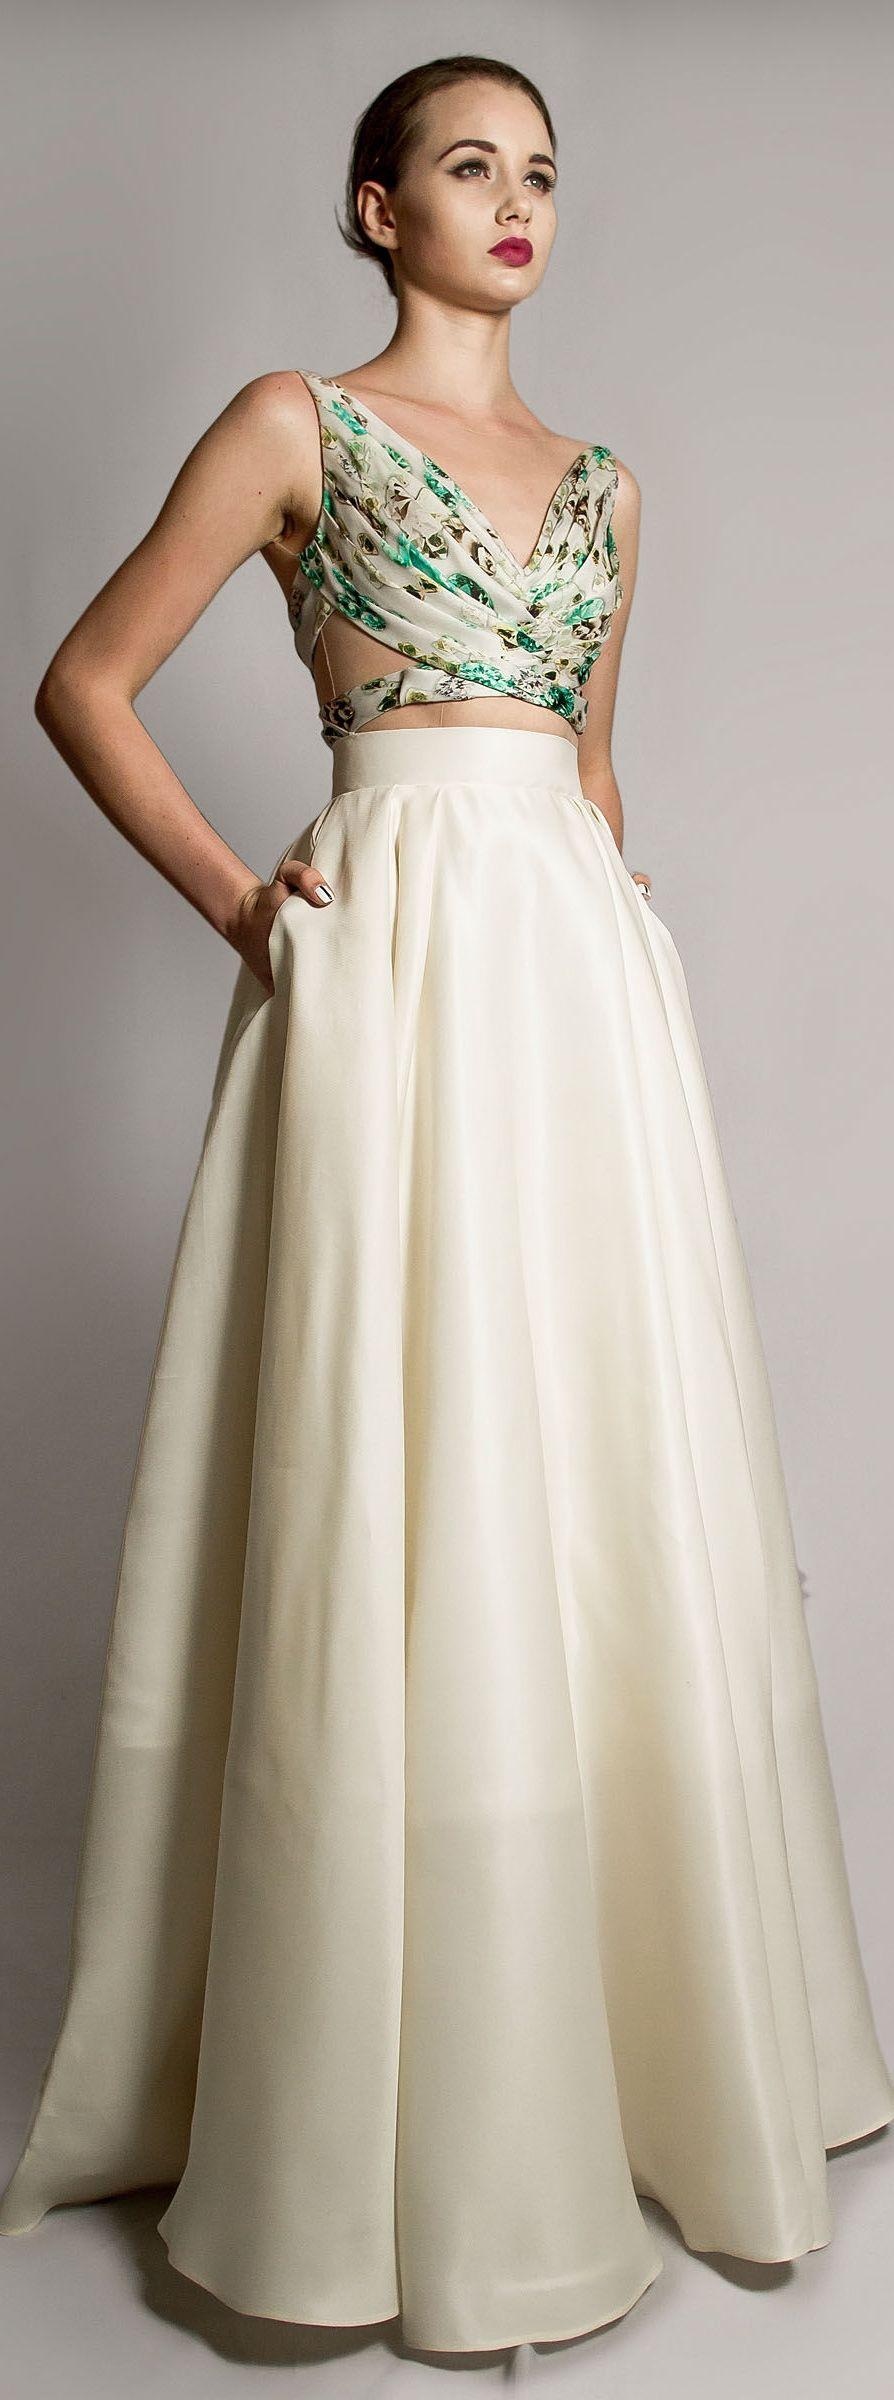 Design your own wedding dress for fun  House of Ronald SS   ekkkk  Pinterest  House Gowns and Black